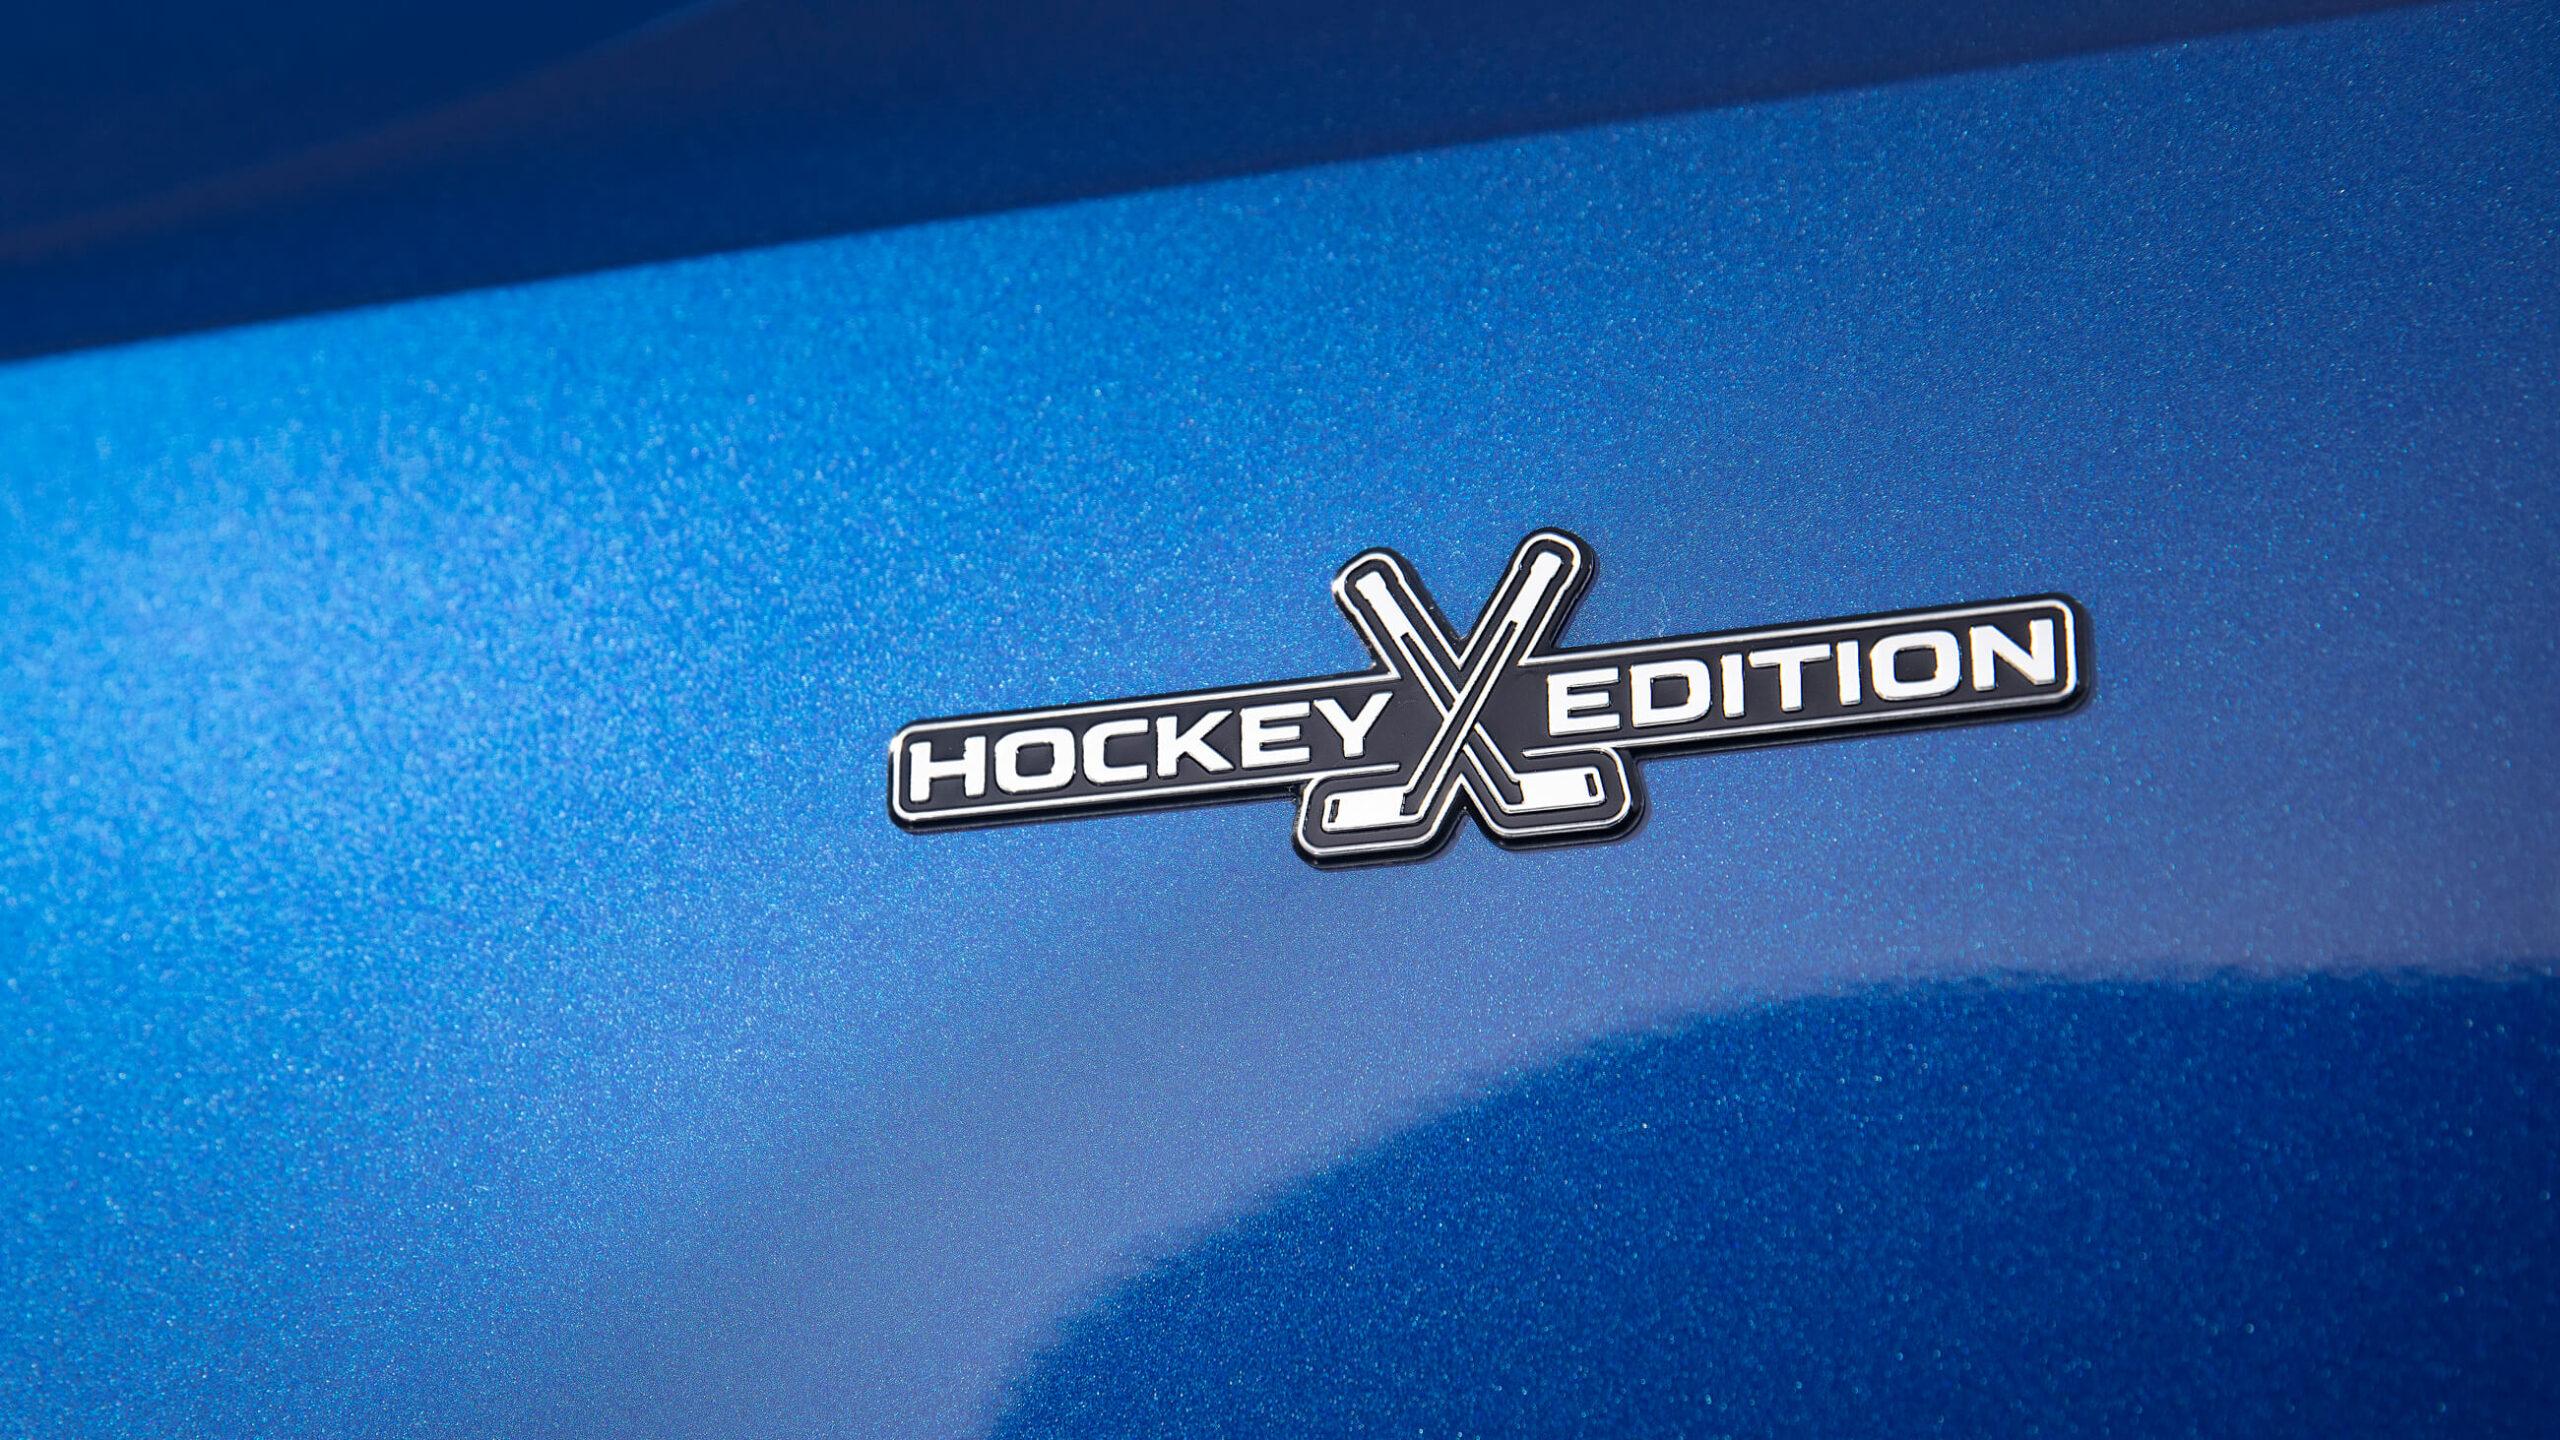 Эмблема Hockey Edition